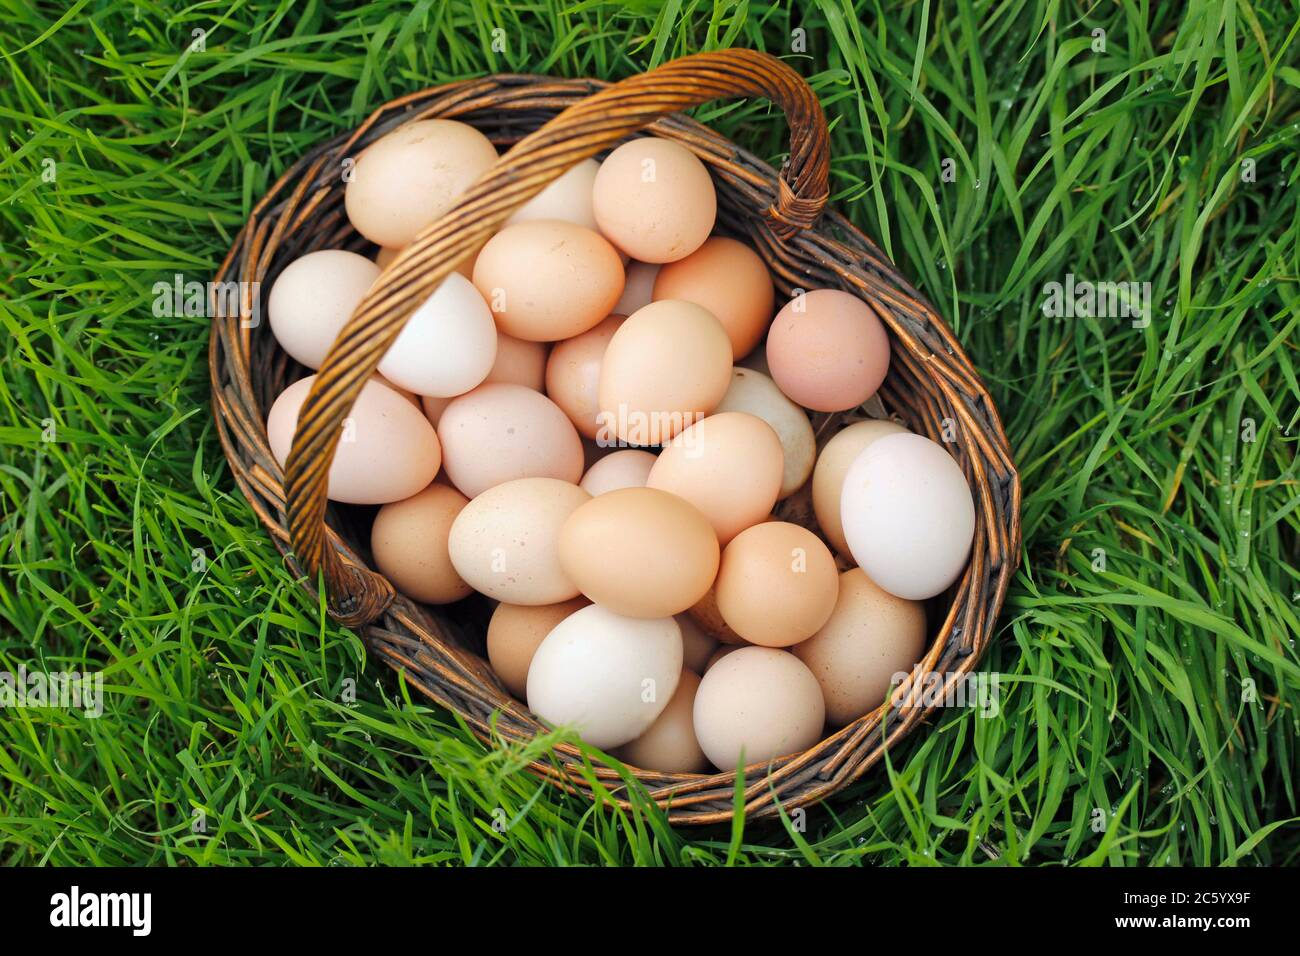 Cesta con huevos. Foto de stock